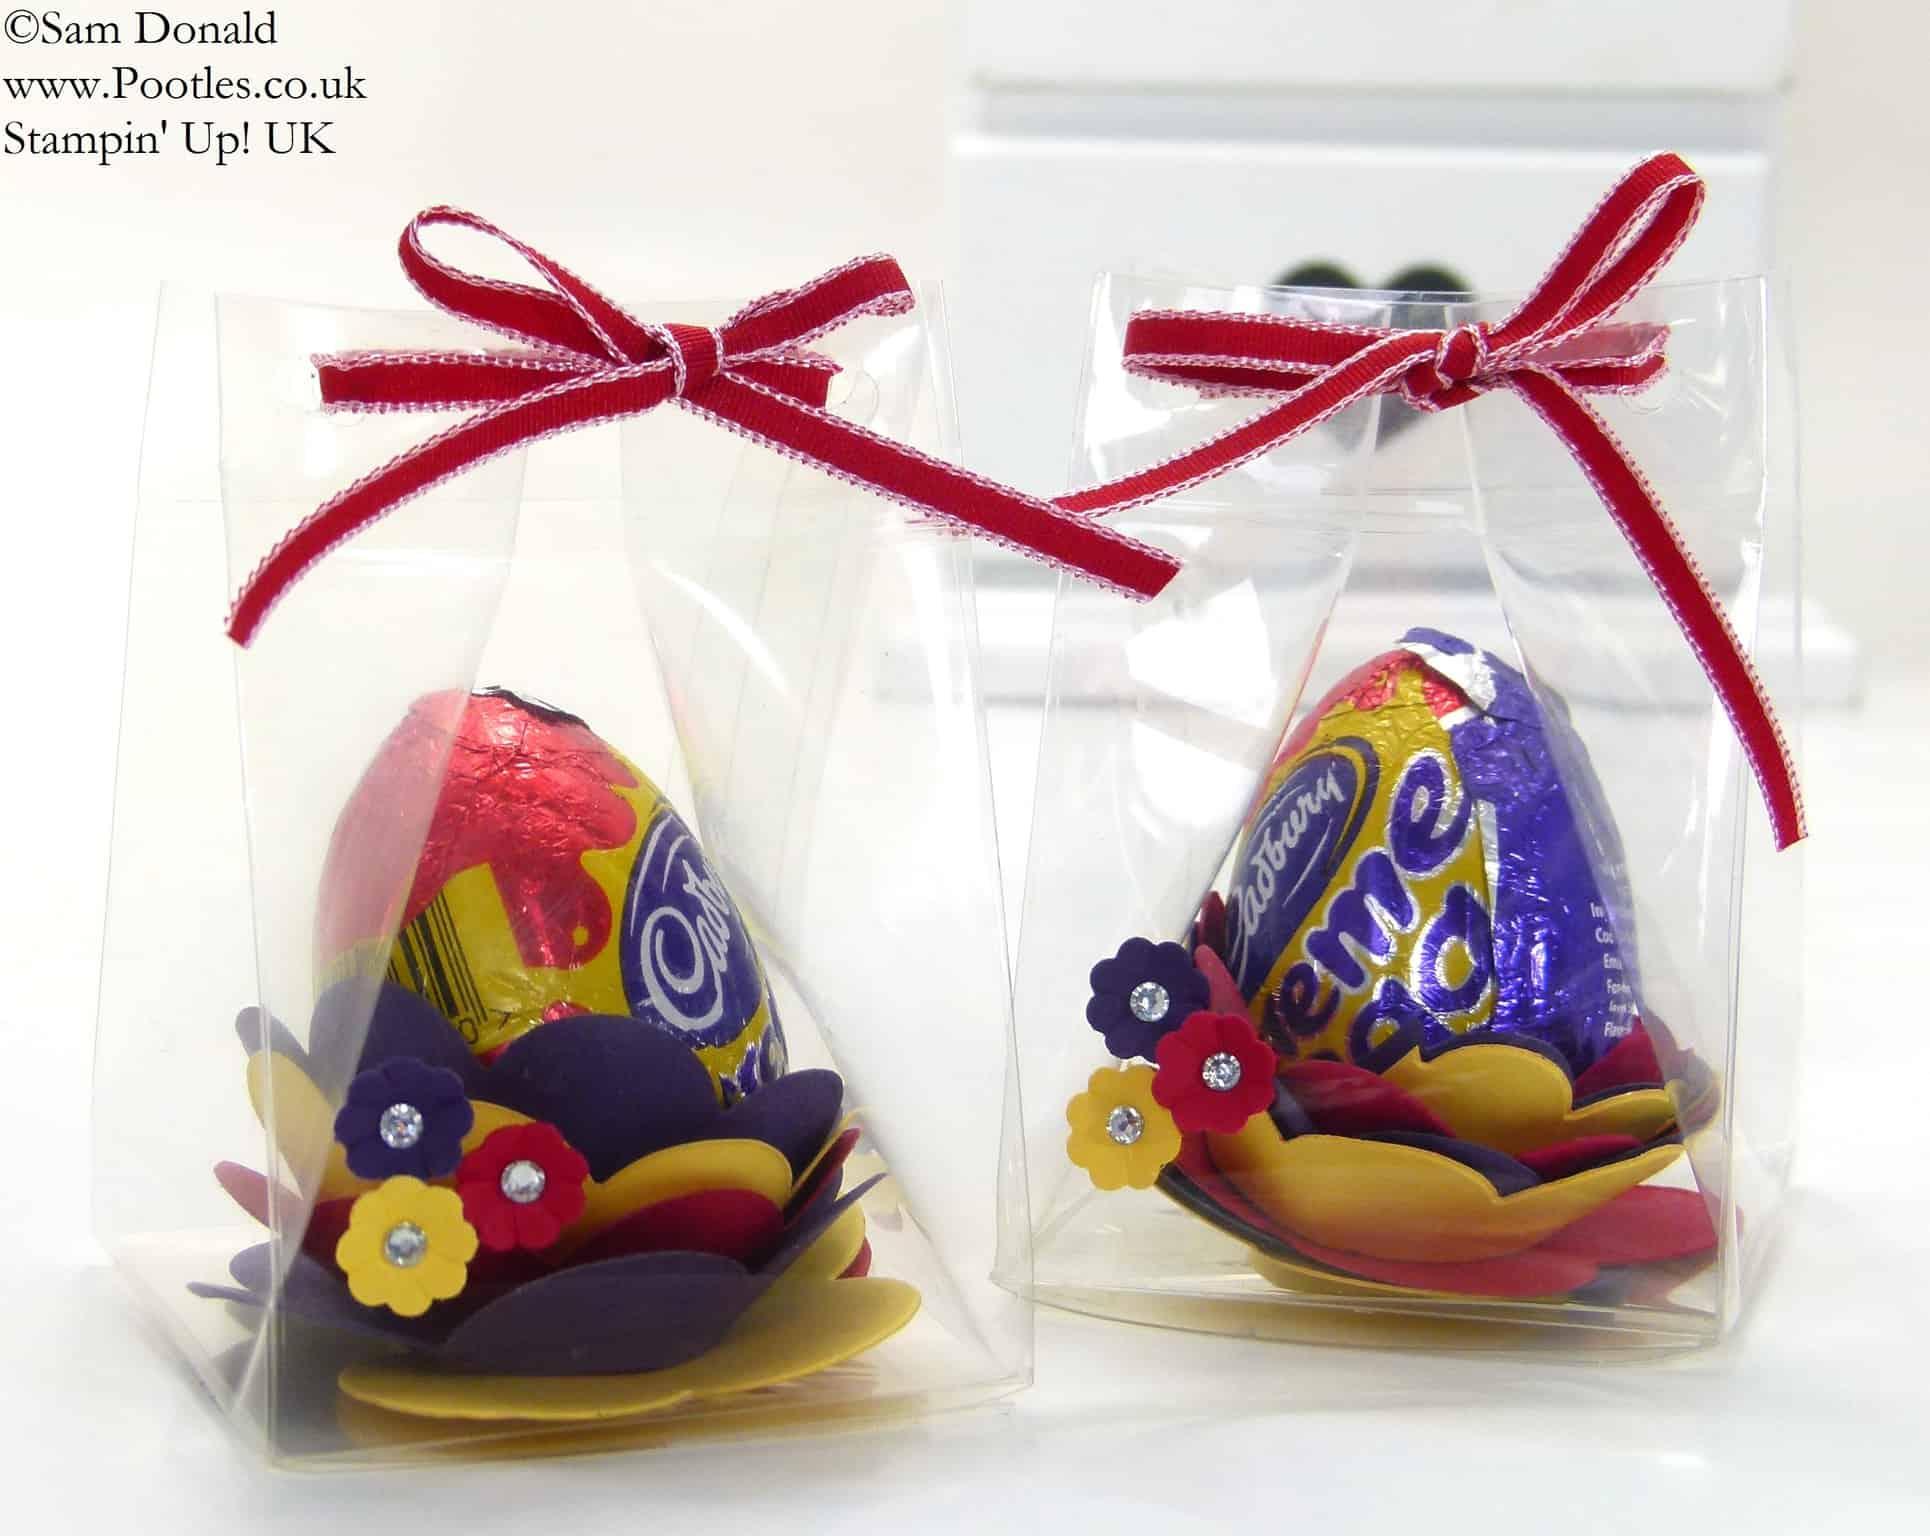 Easter Egg Spiral Flower Die Clear Box Tutorial